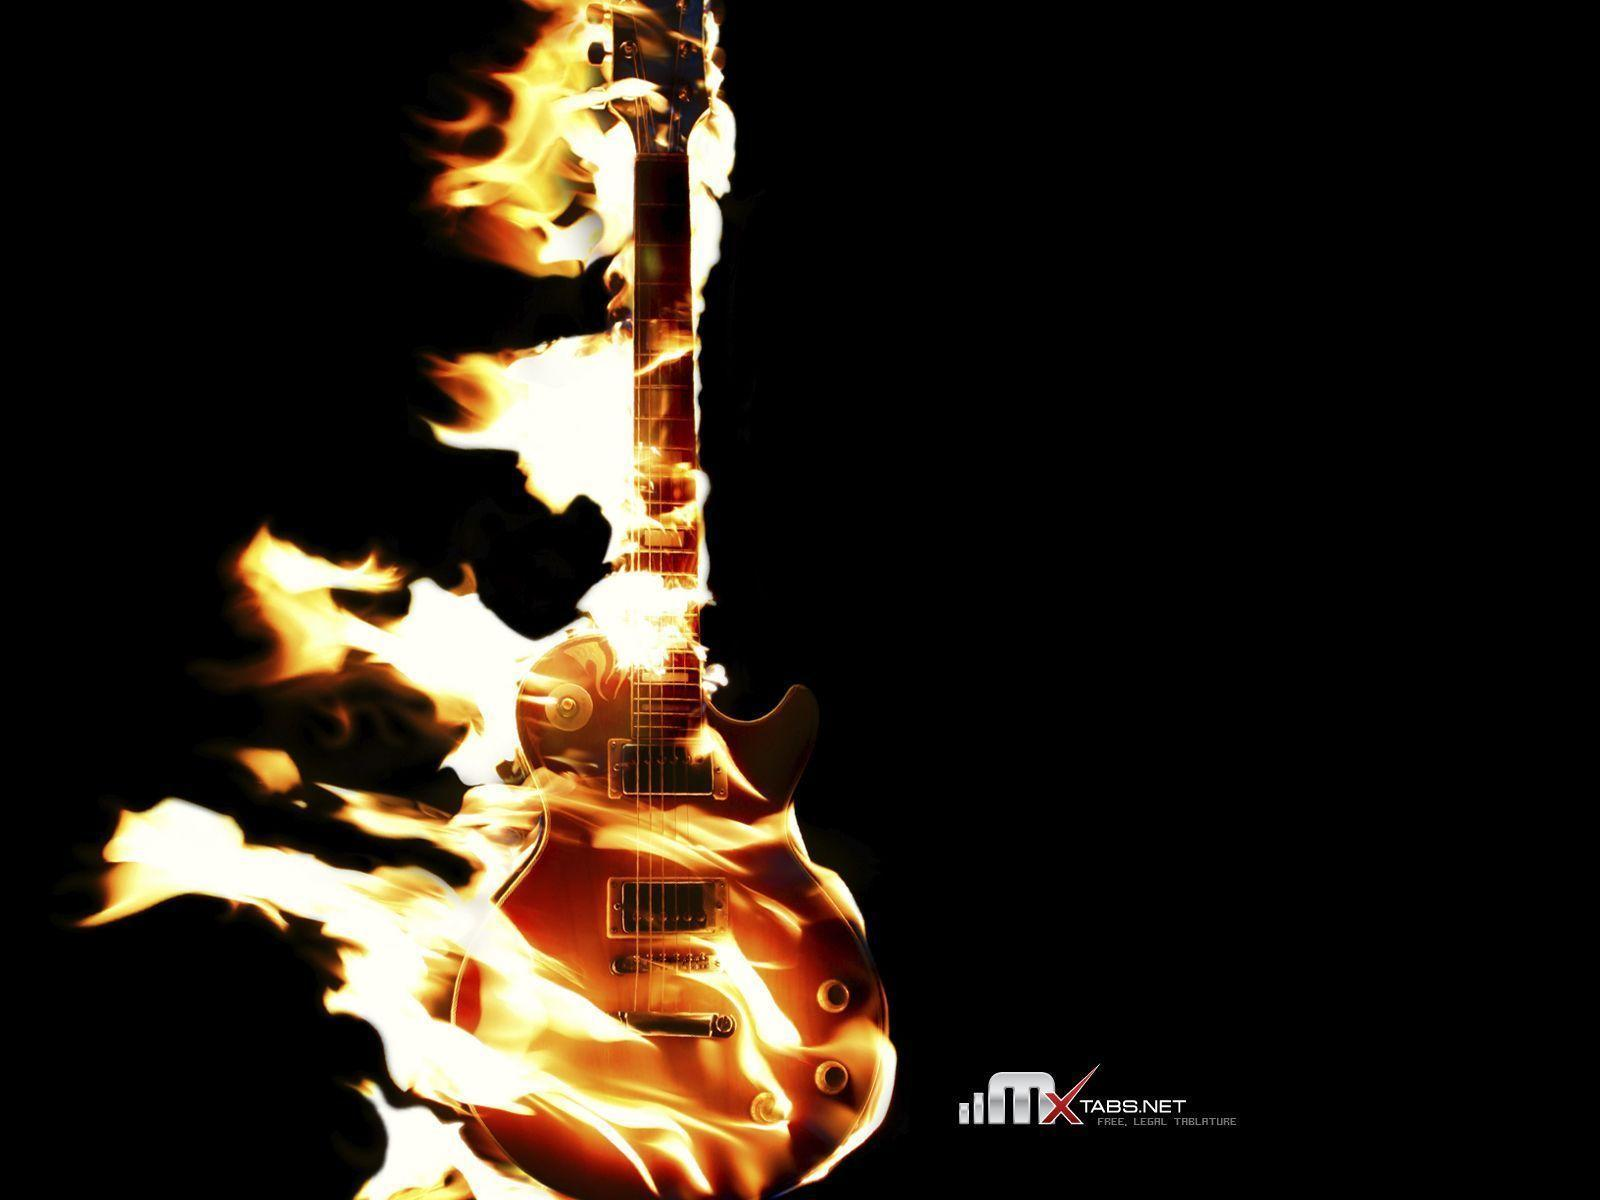 Guitar Image Hd Hd Background Wallpaper 50 HD Wallpapers | www ...